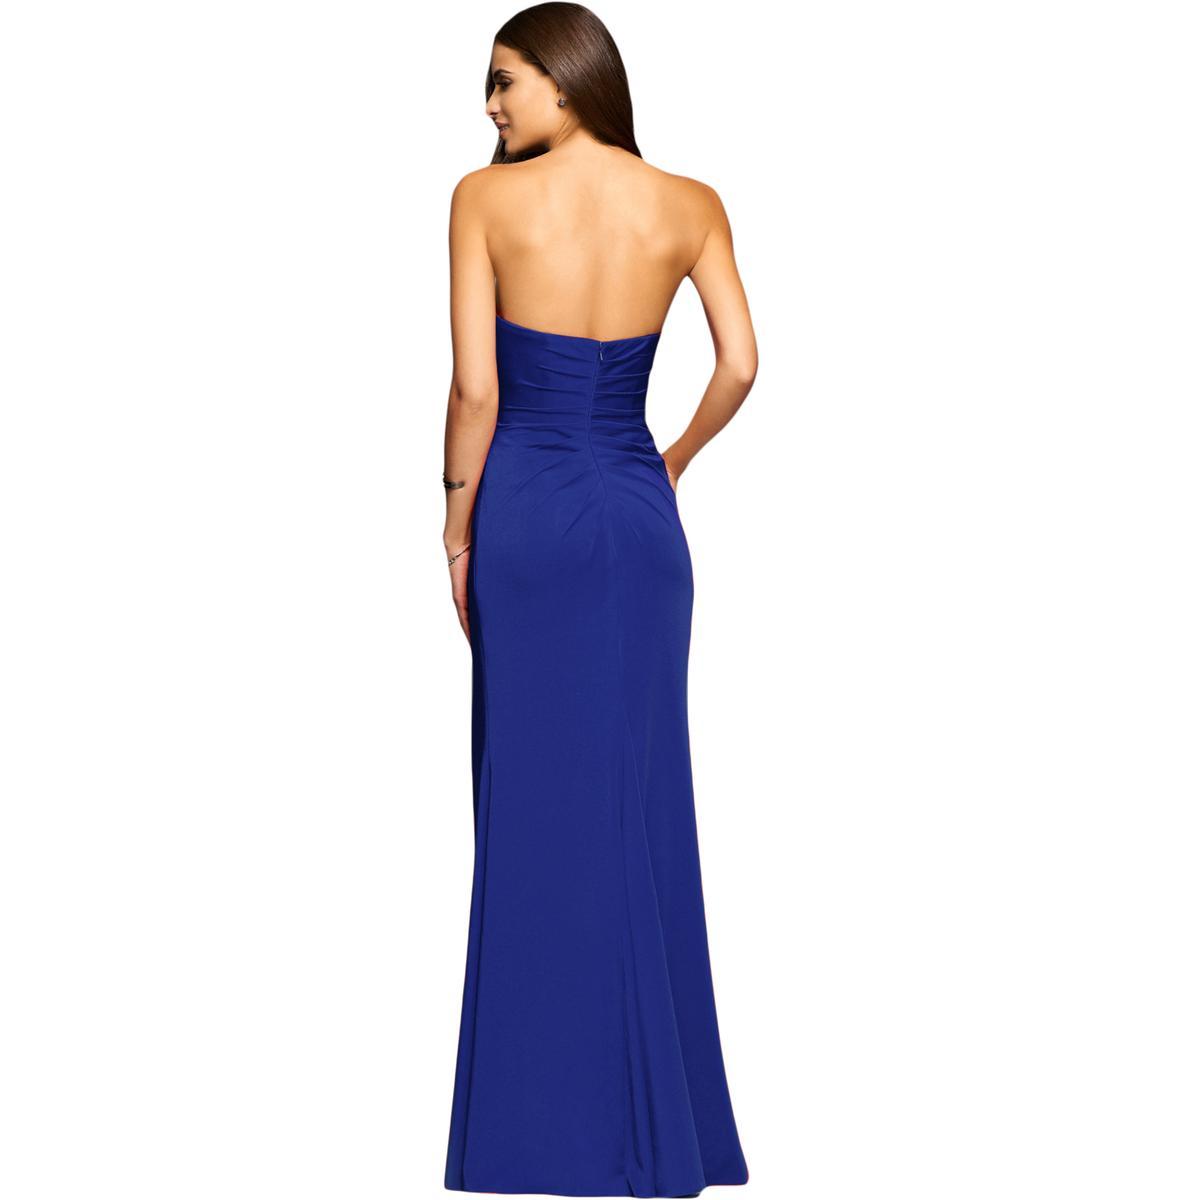 Faviana Womens Satin Prom Special Occasion Evening Dress Dress Dress Gown BHFO 3611 878b7f